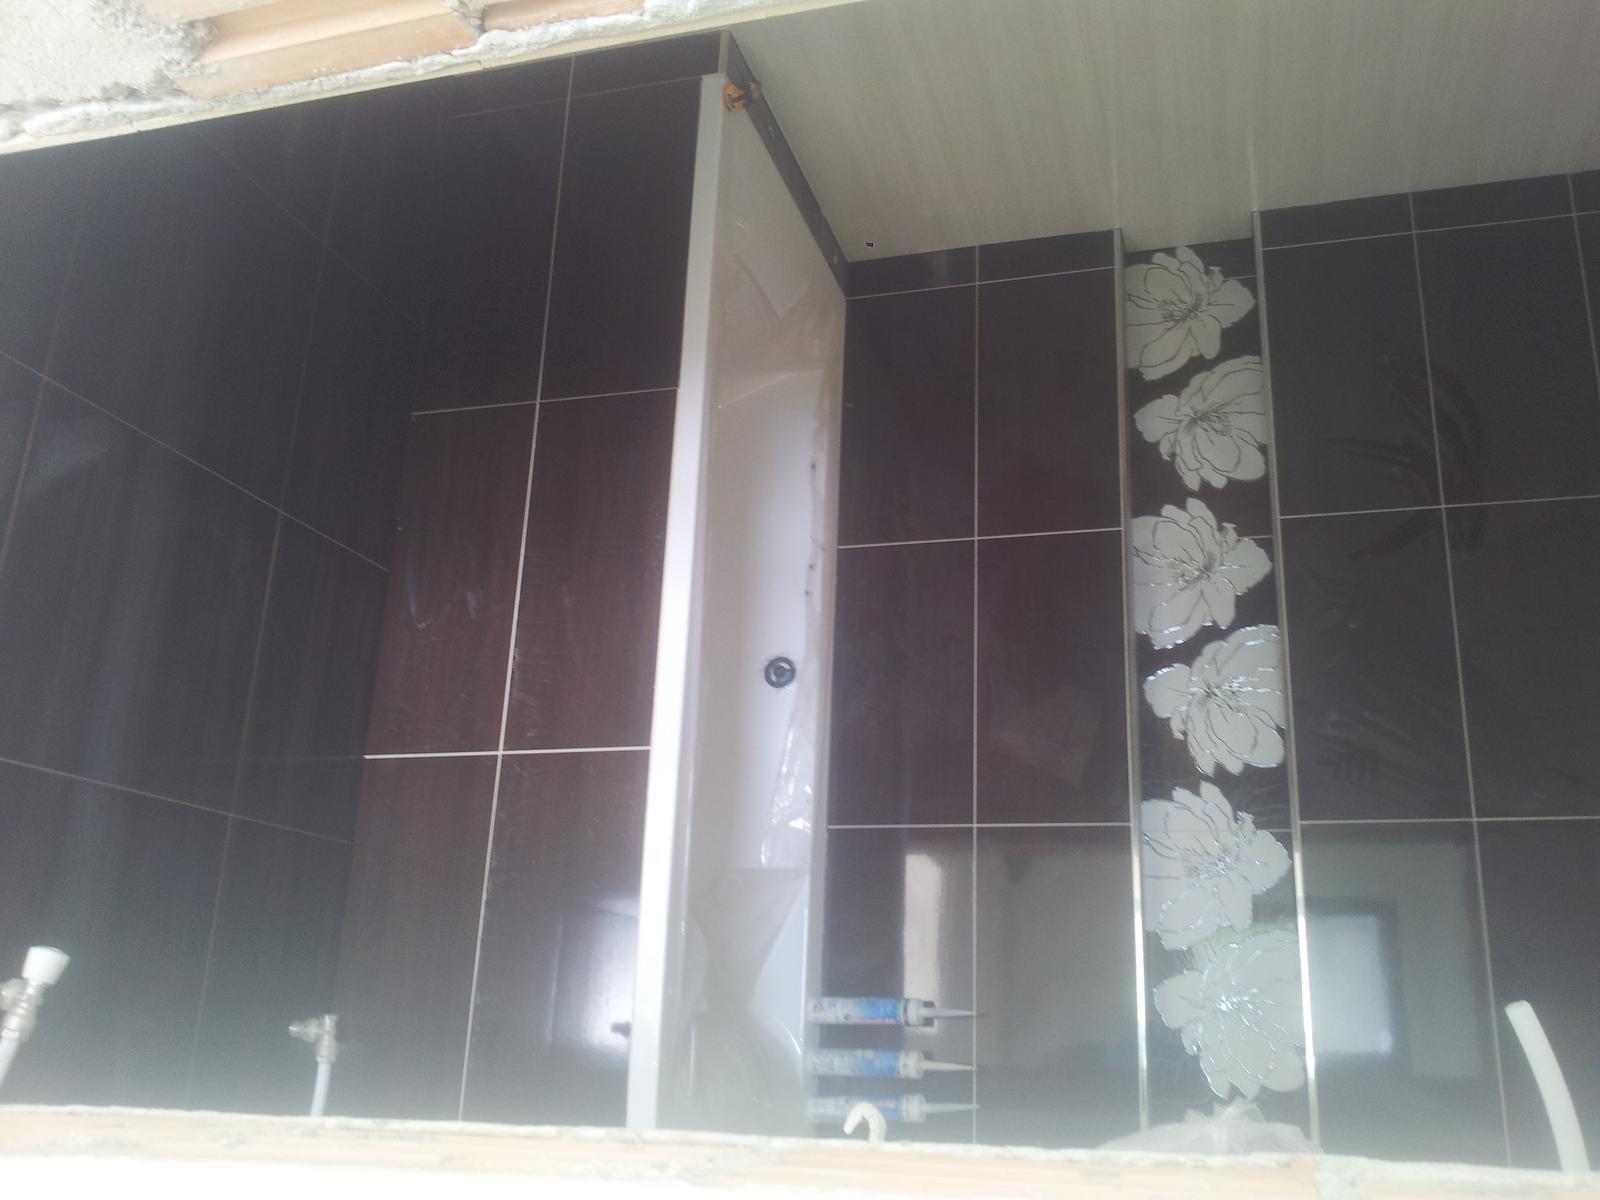 Naš domček 17.6.2013 - dalsia kúpeľňa